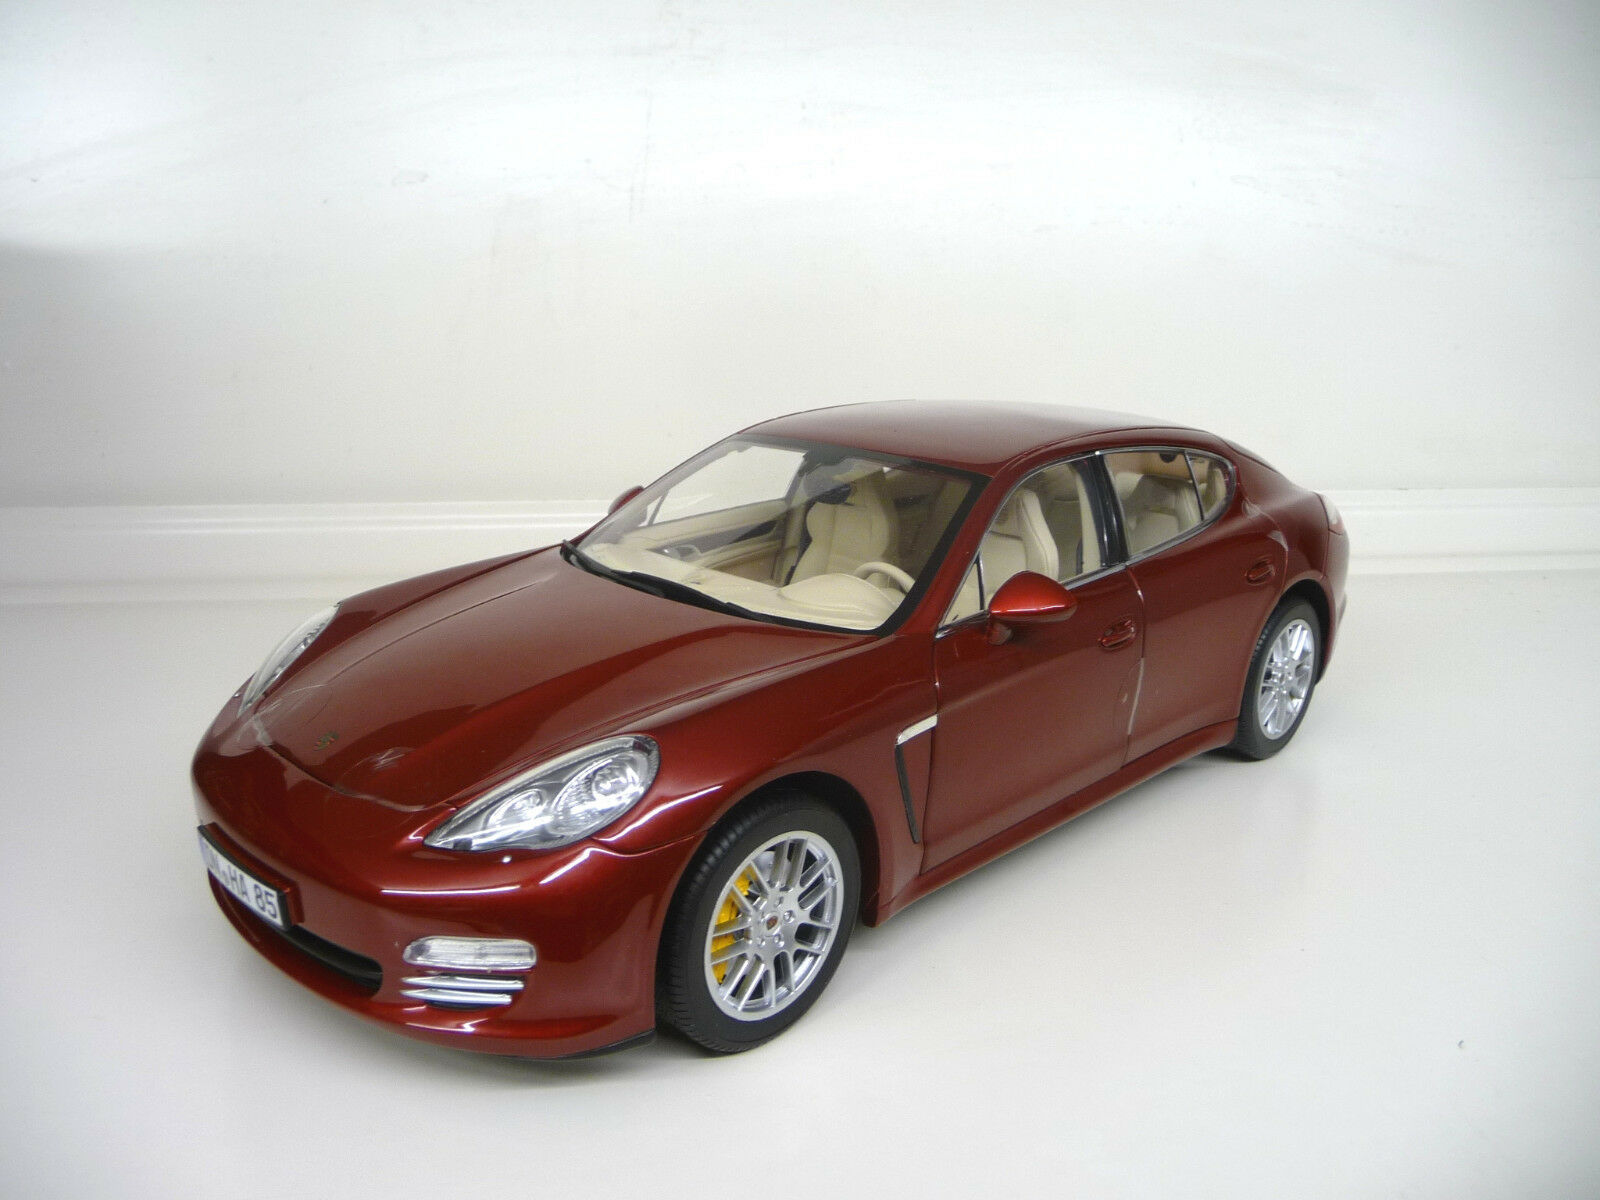 Porsche panamera 4s rot edition norev 1,18 free shipping worldwide.